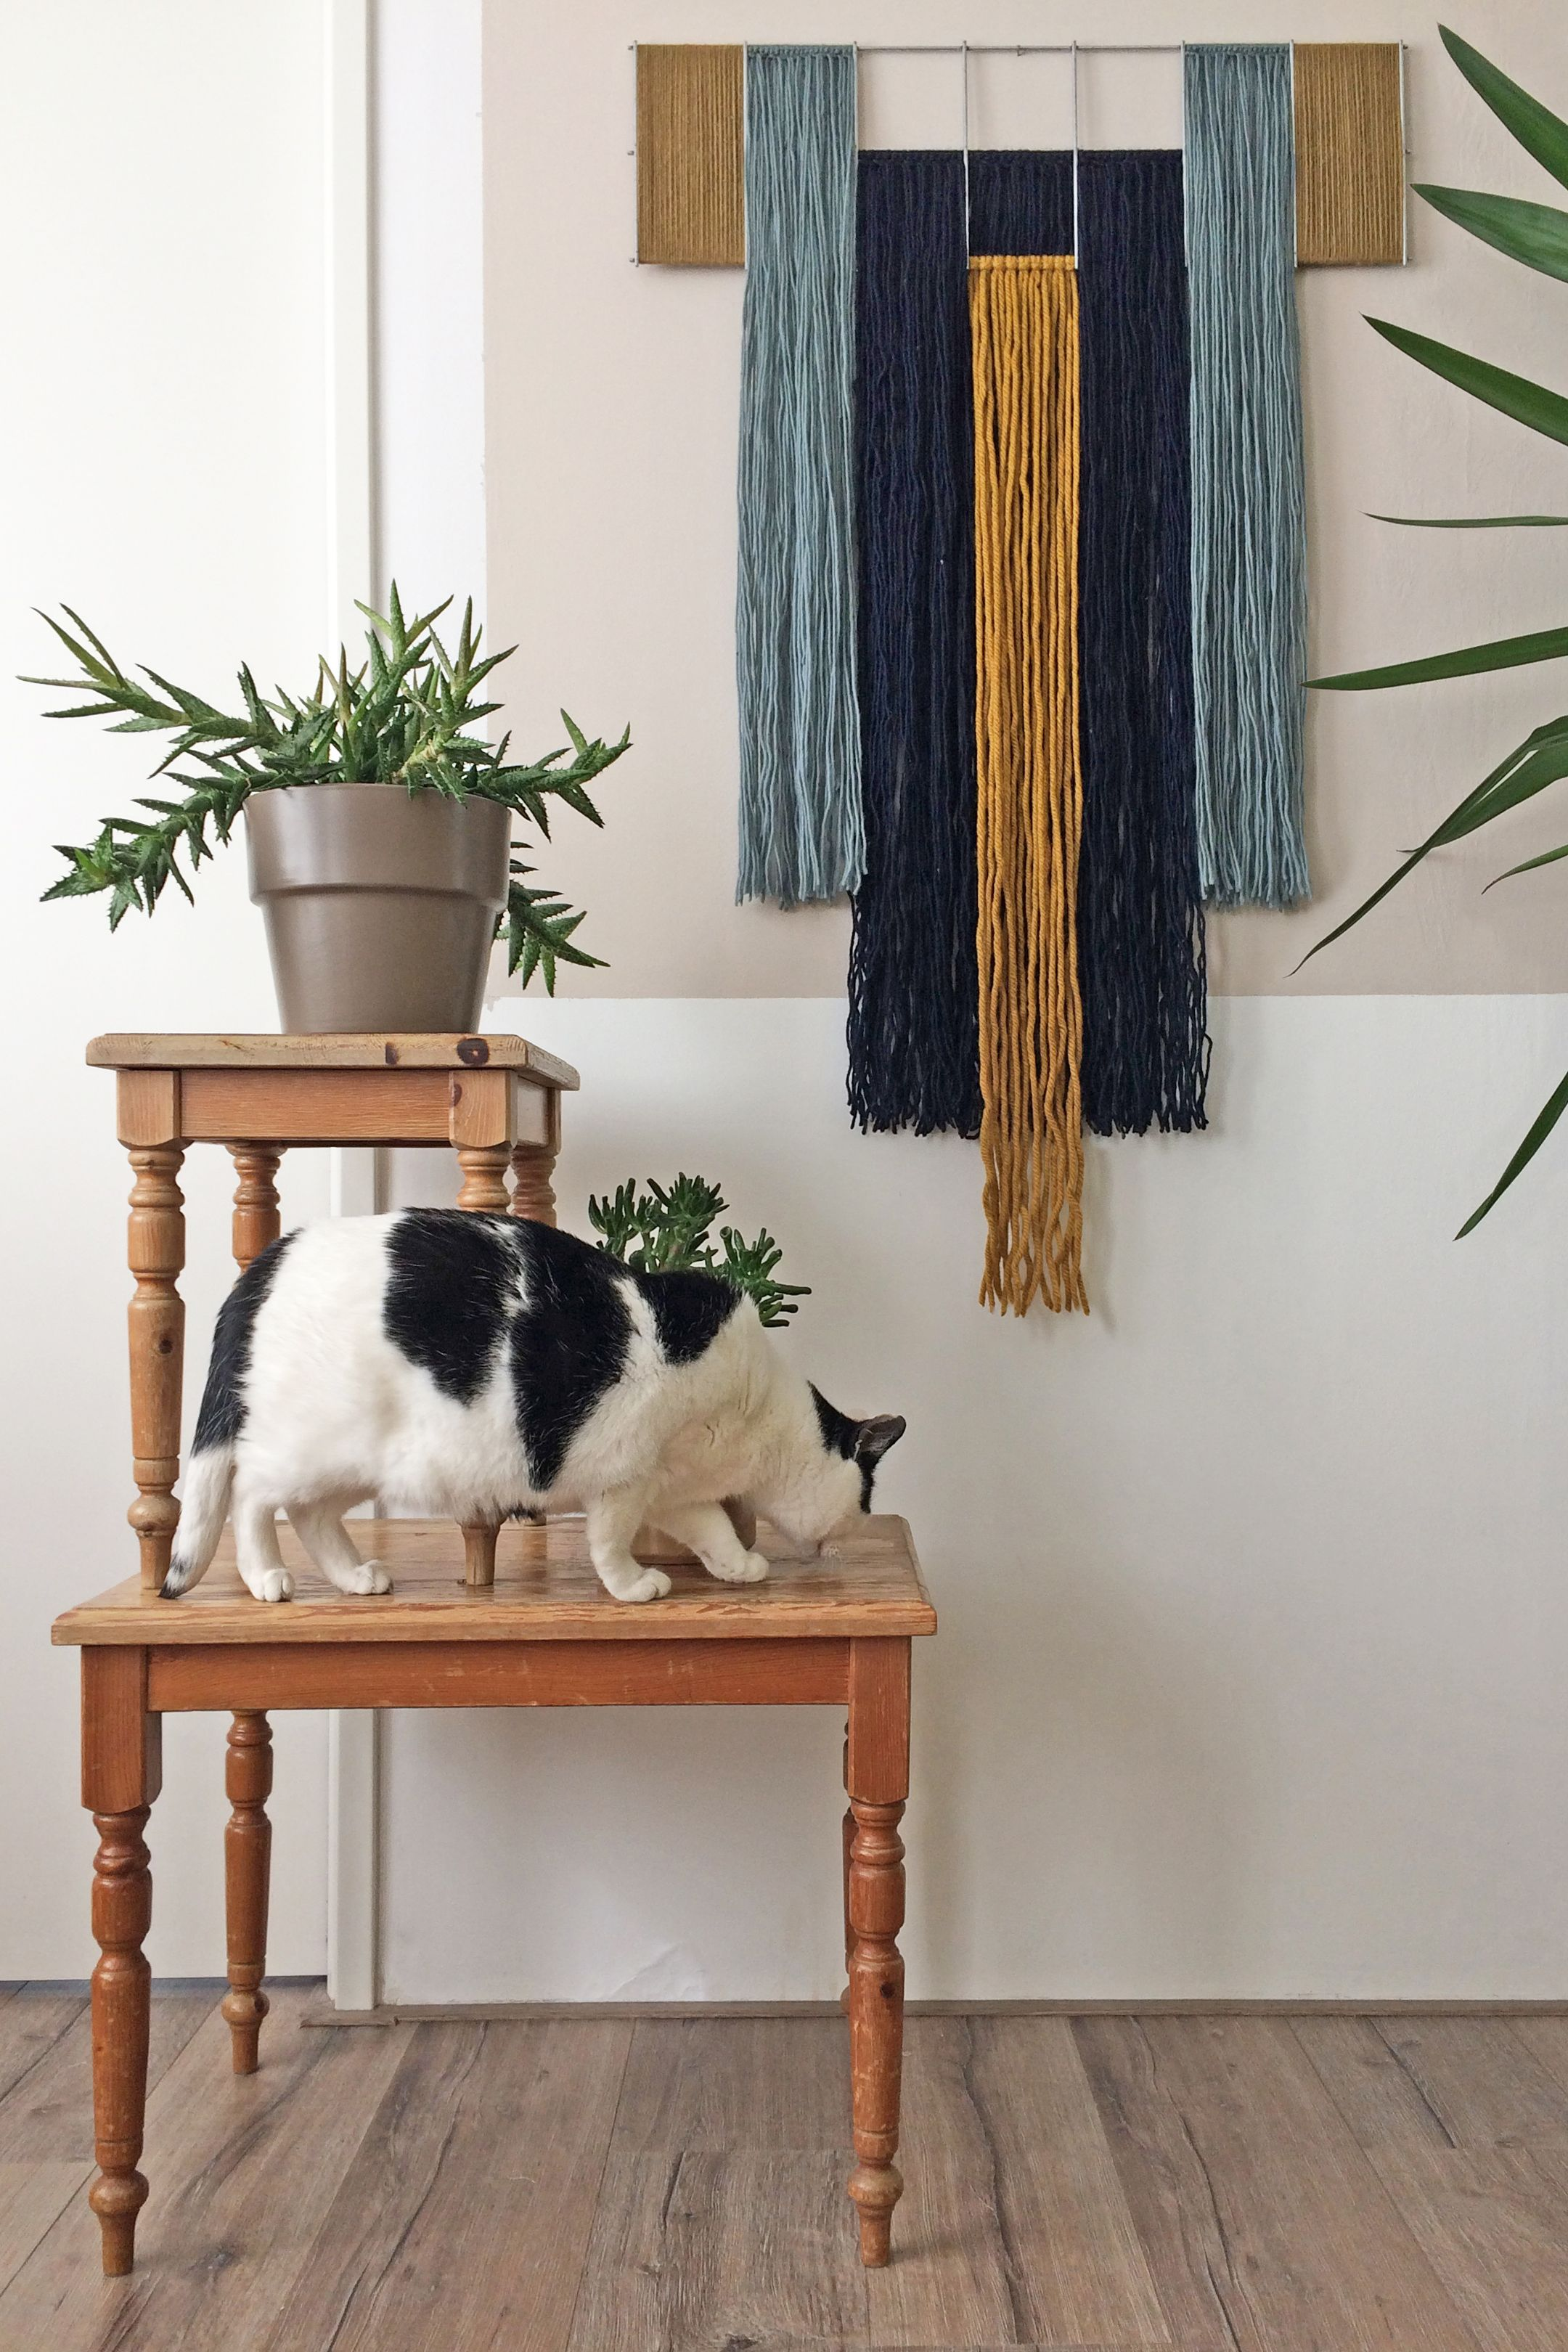 Macrame Wall Hanging With Metal Grid Geometric Tapestry Contemporary Fiber Art Wool Yarn Blue Ochre Mustard Colorful Wall Art In 2020 Yarn Wall Art Yarn Wall Hanging Wool Wall Hanging